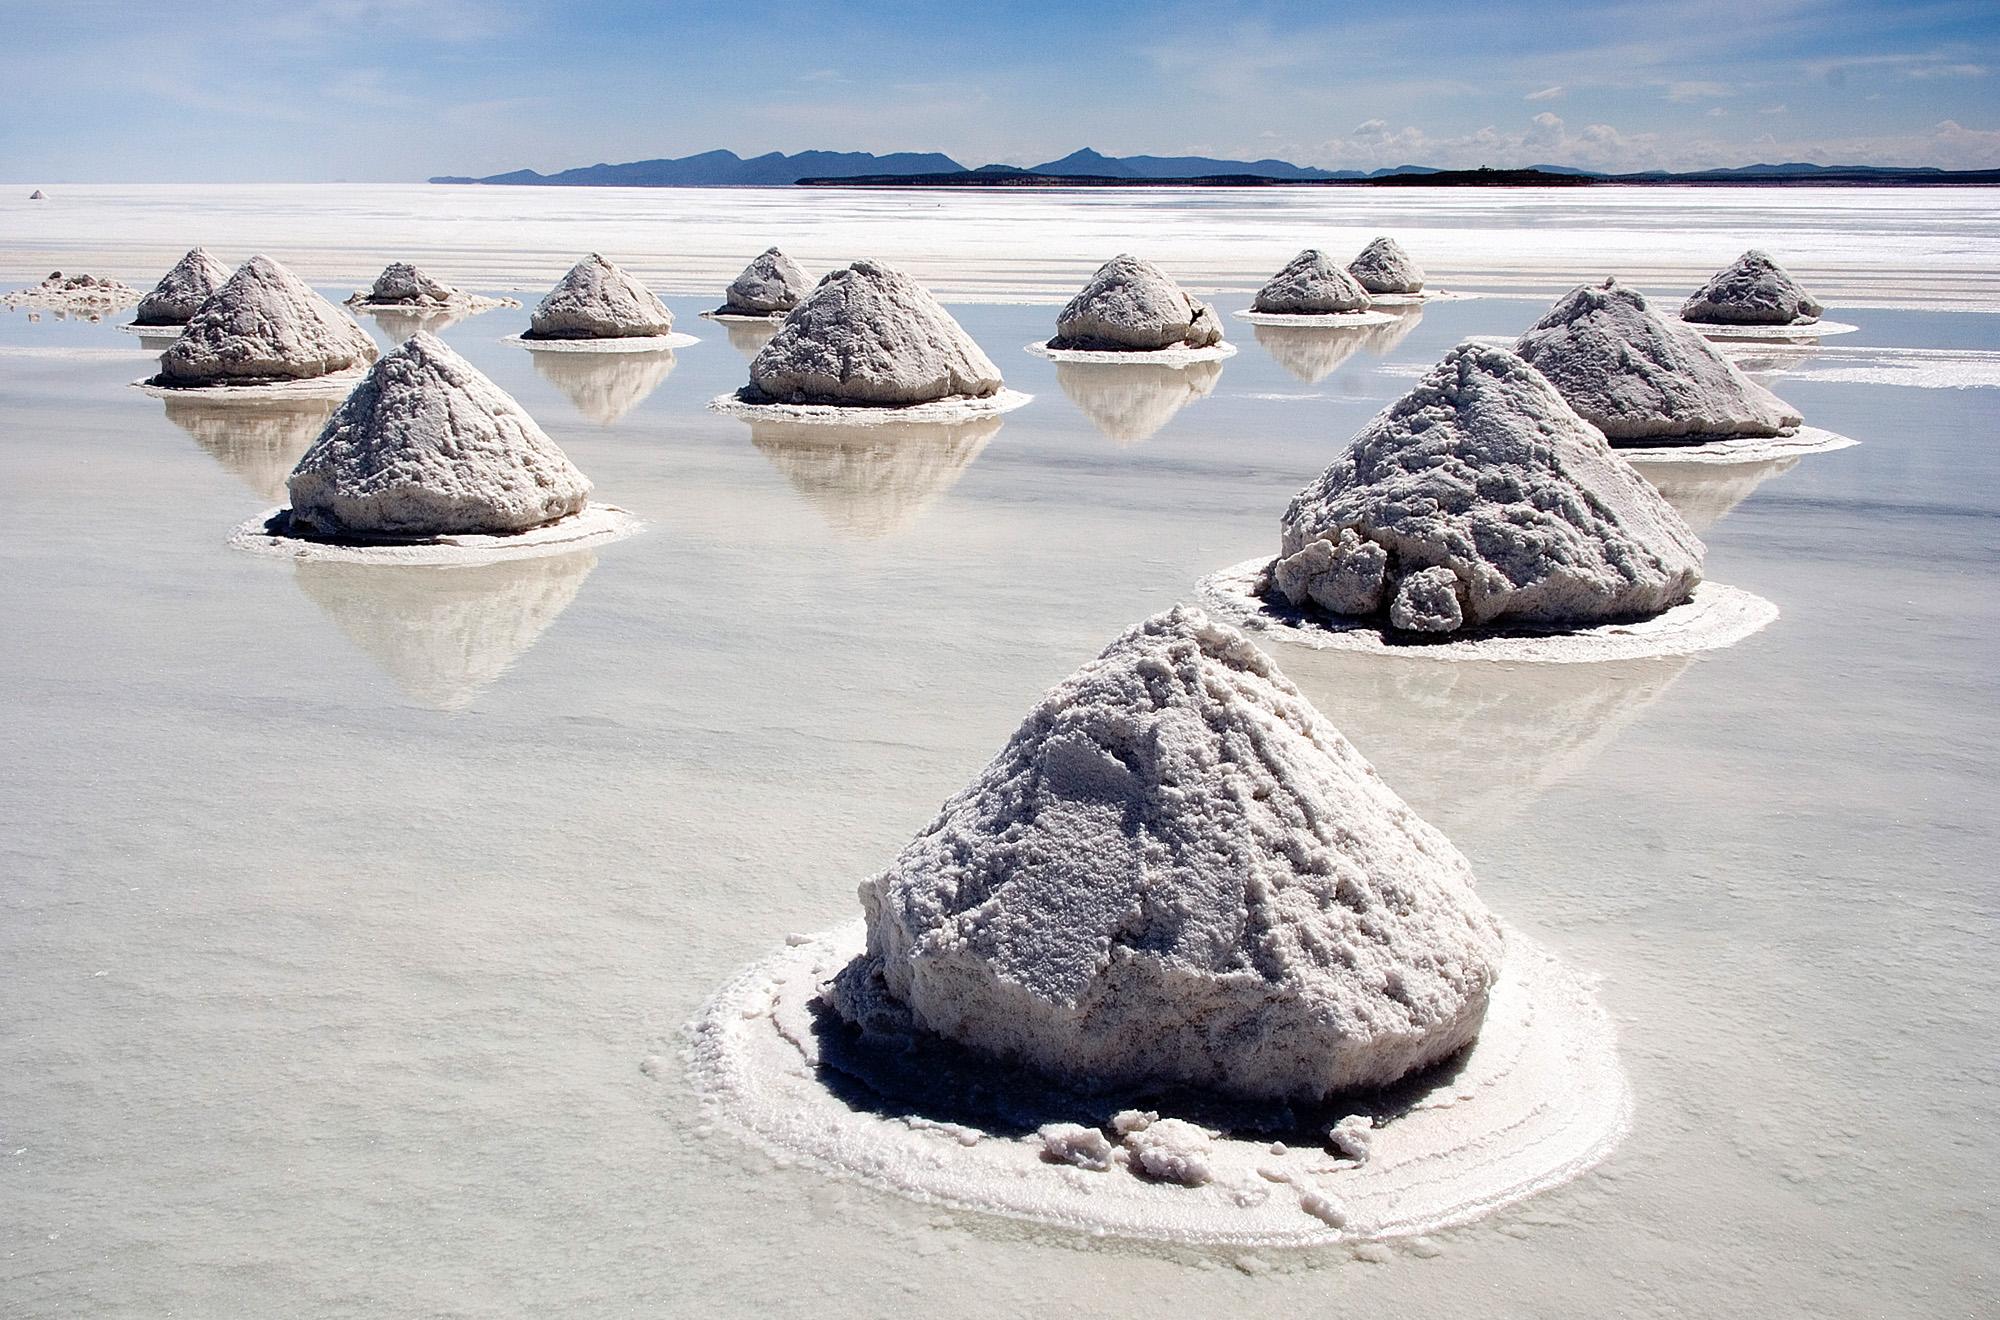 8-Salar de Uyuni salt flat in Bolivia